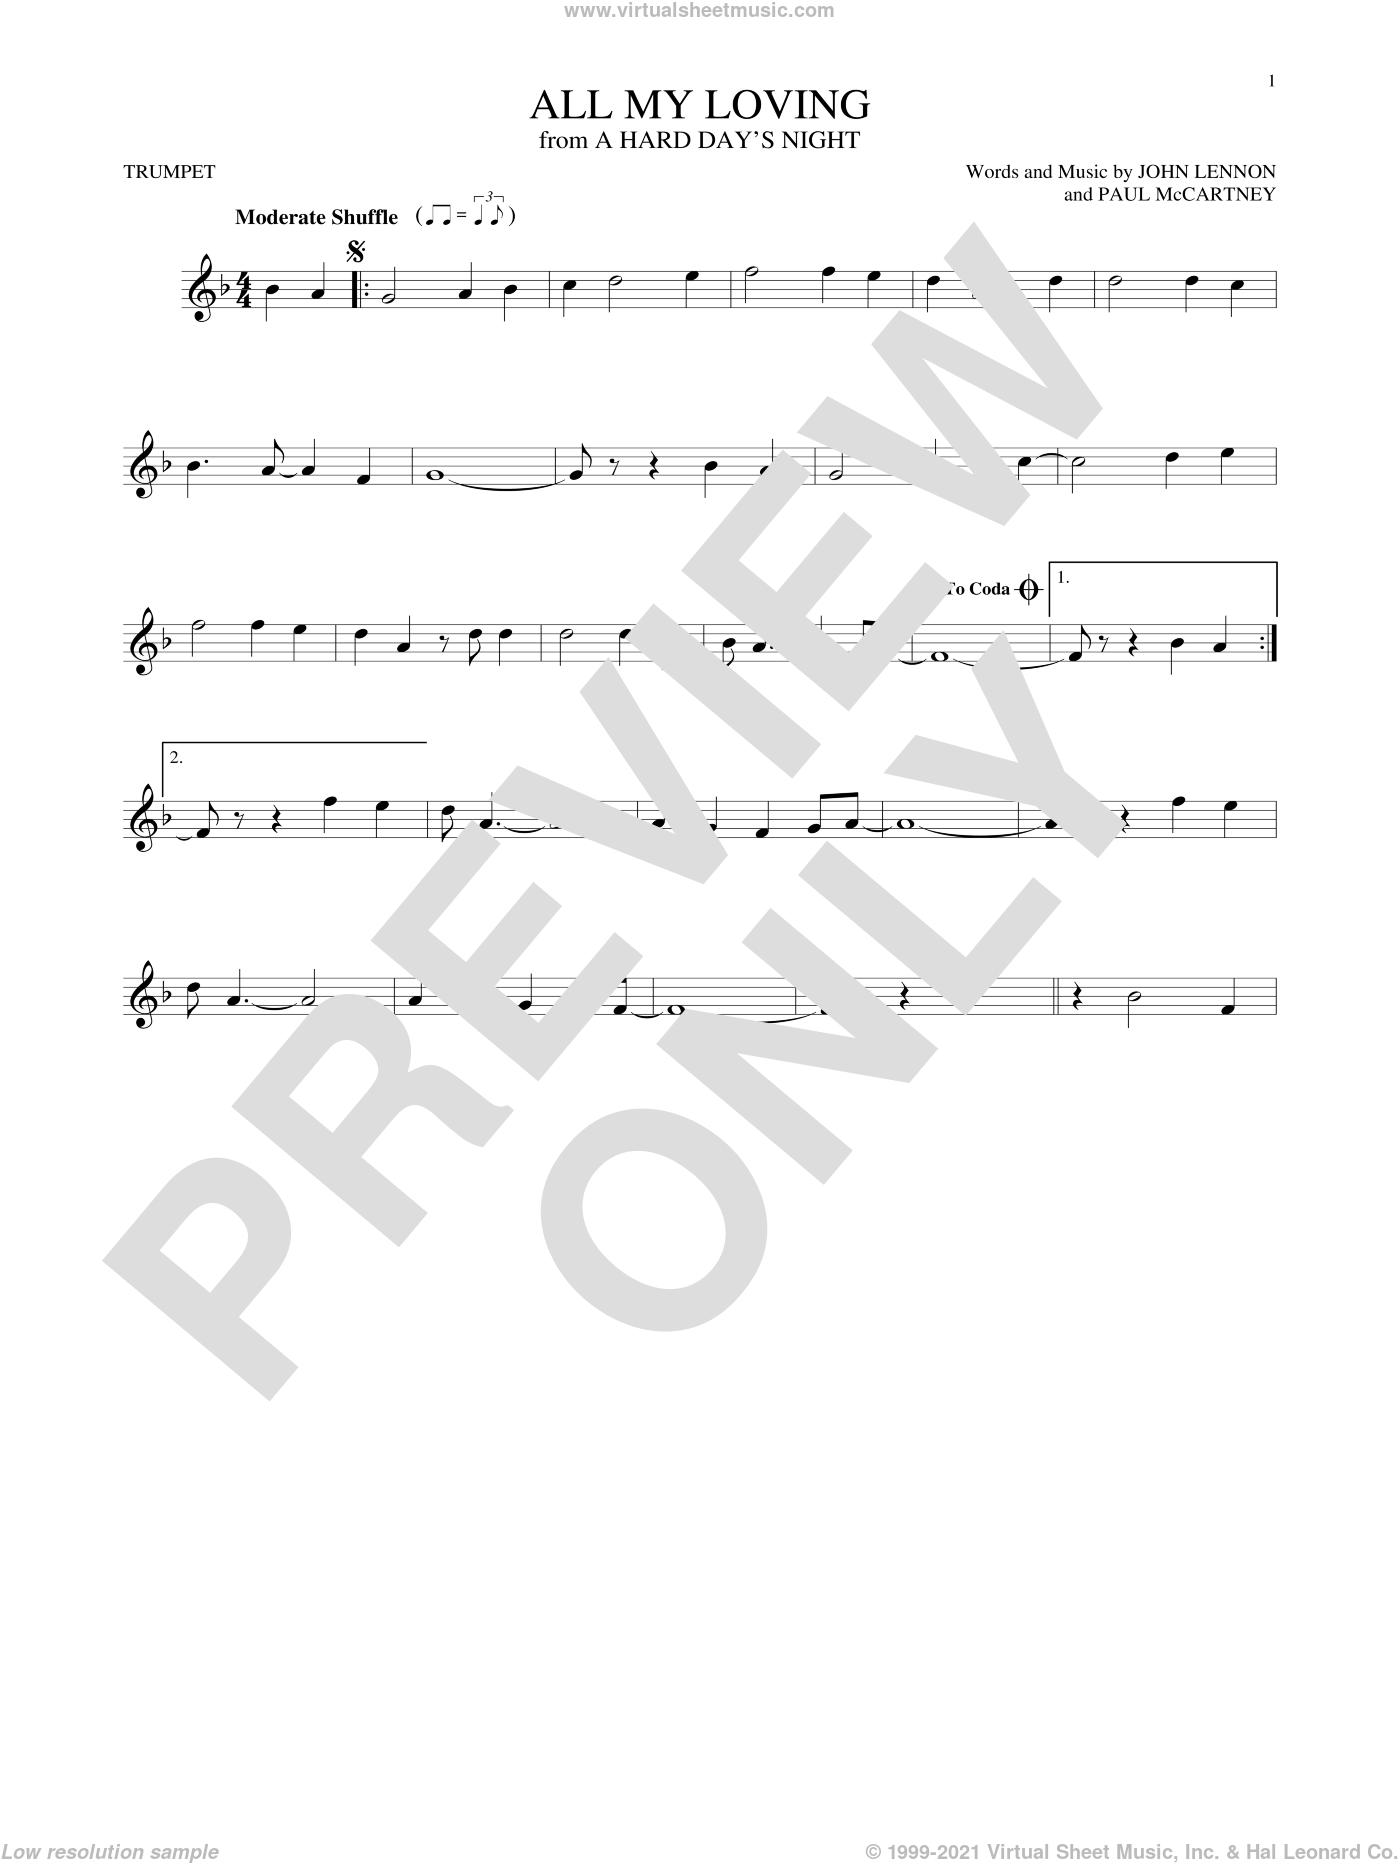 All My Loving sheet music for trumpet solo by The Beatles, John Lennon and Paul McCartney, intermediate skill level